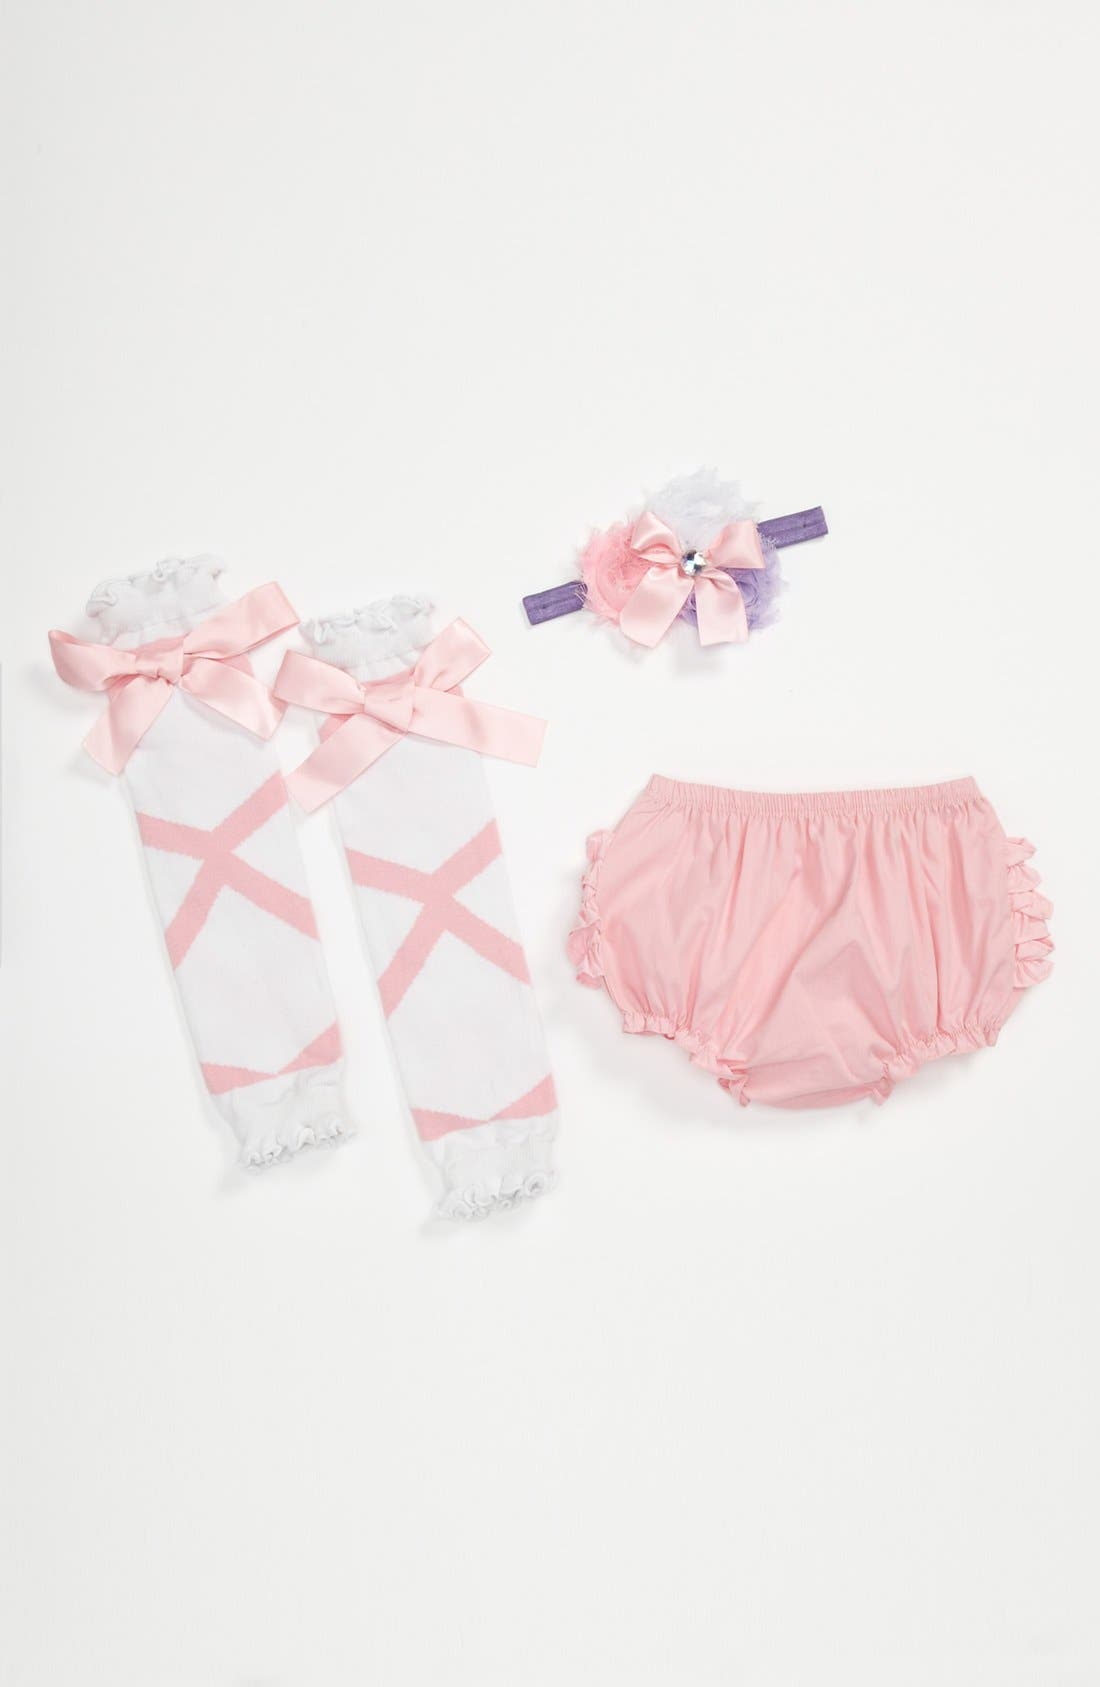 Alternate Image 1 Selected - RuffleButts 'Ballerina' Headband, Bloomers & Leg Warmers (Baby)